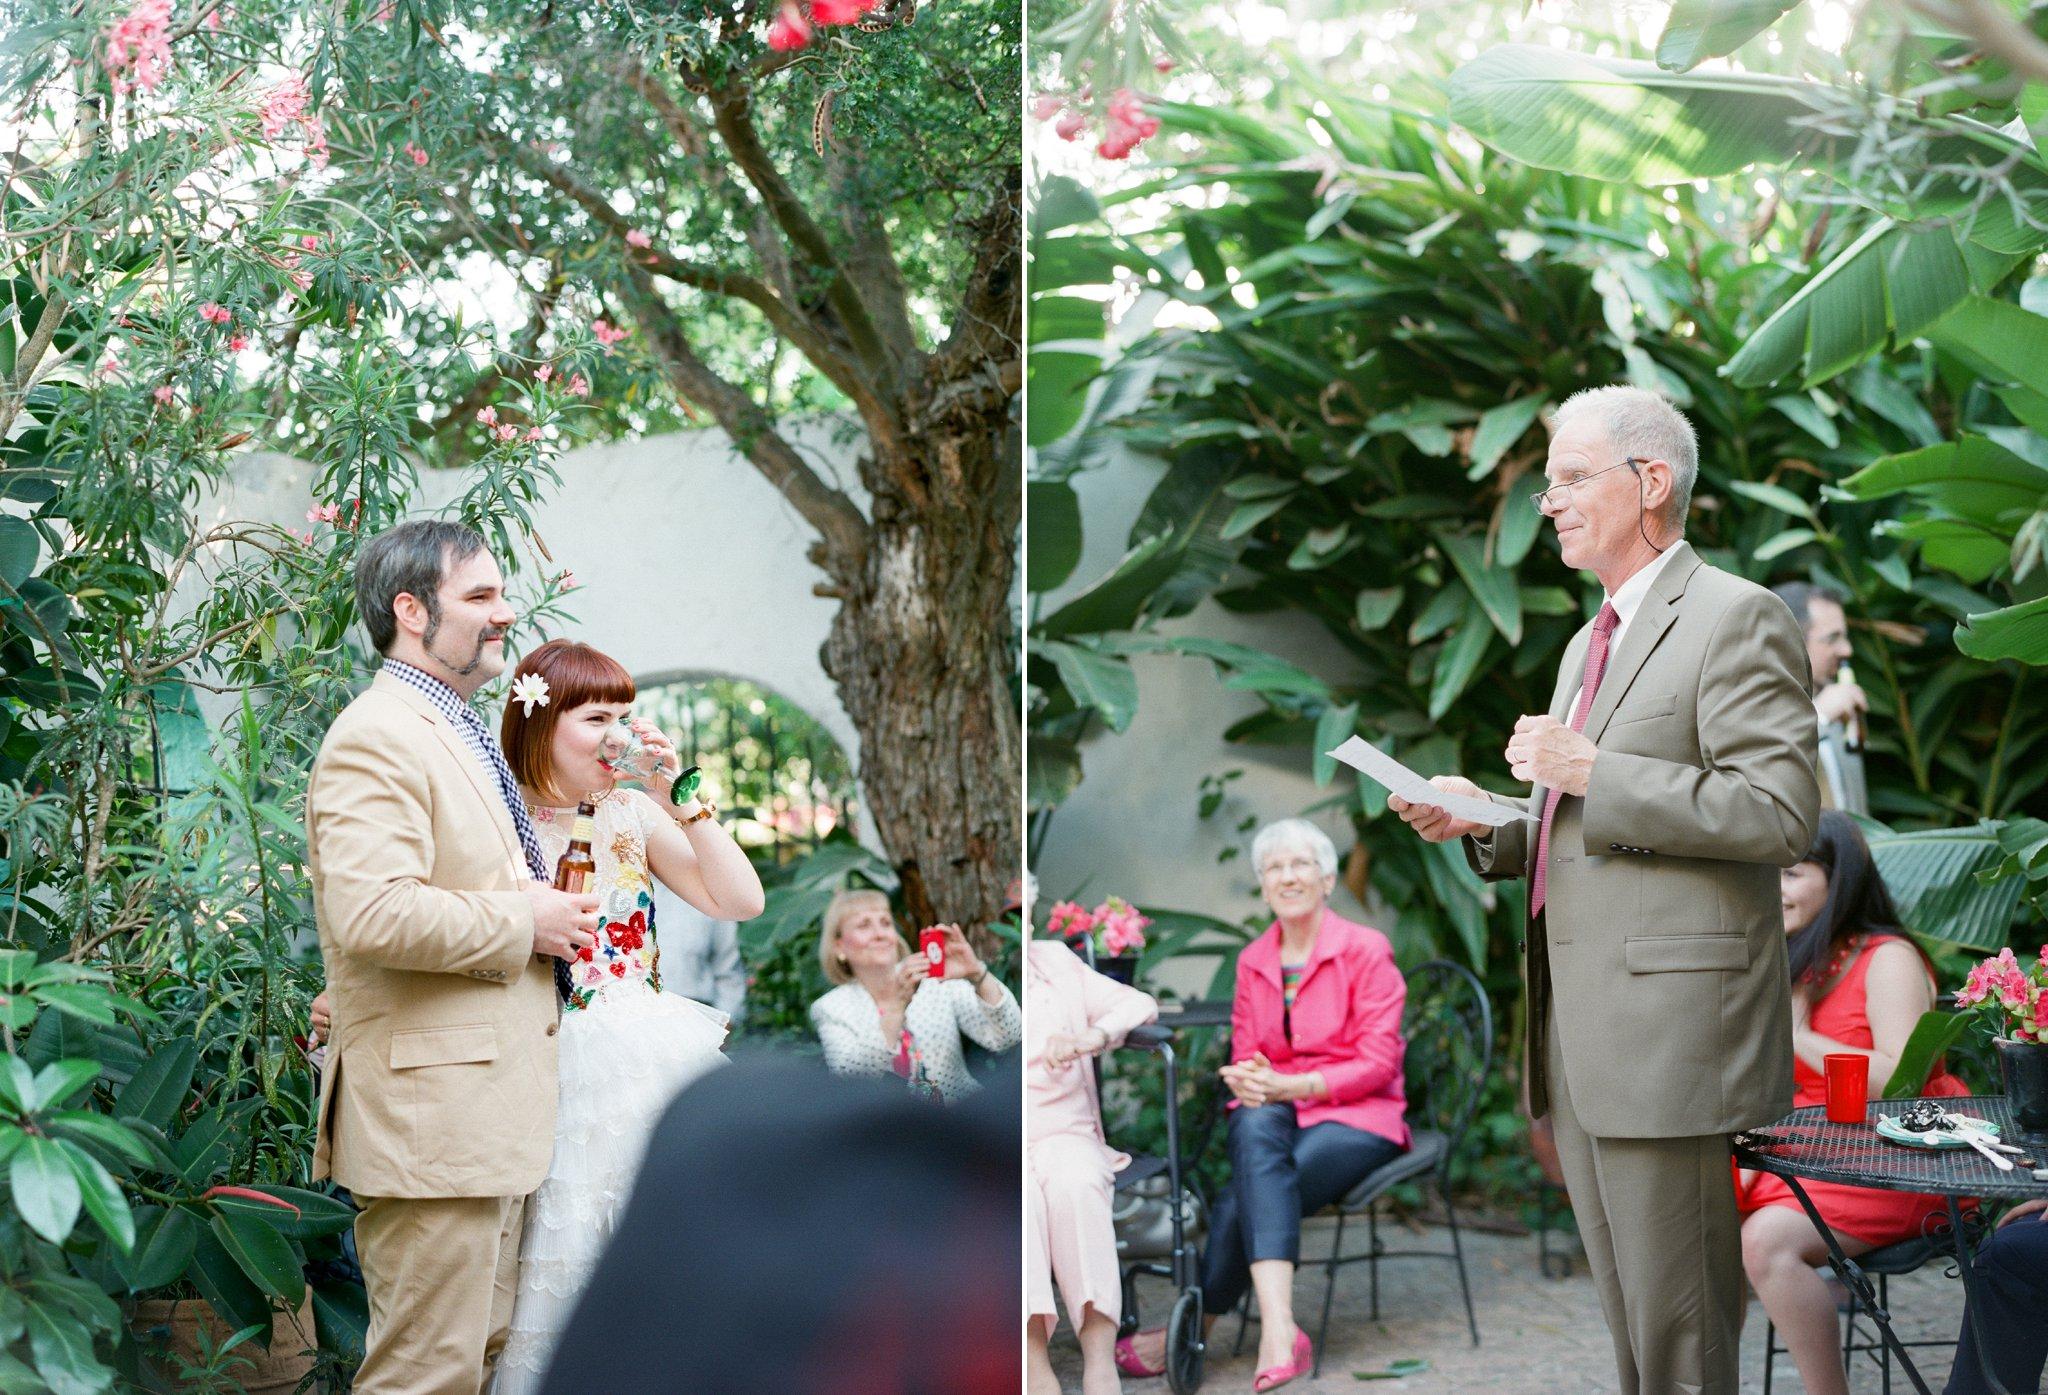 eclectic texan wedding the connoisseur of cute wedding texas wedding photographer shannon griffin photography_0024.jpg